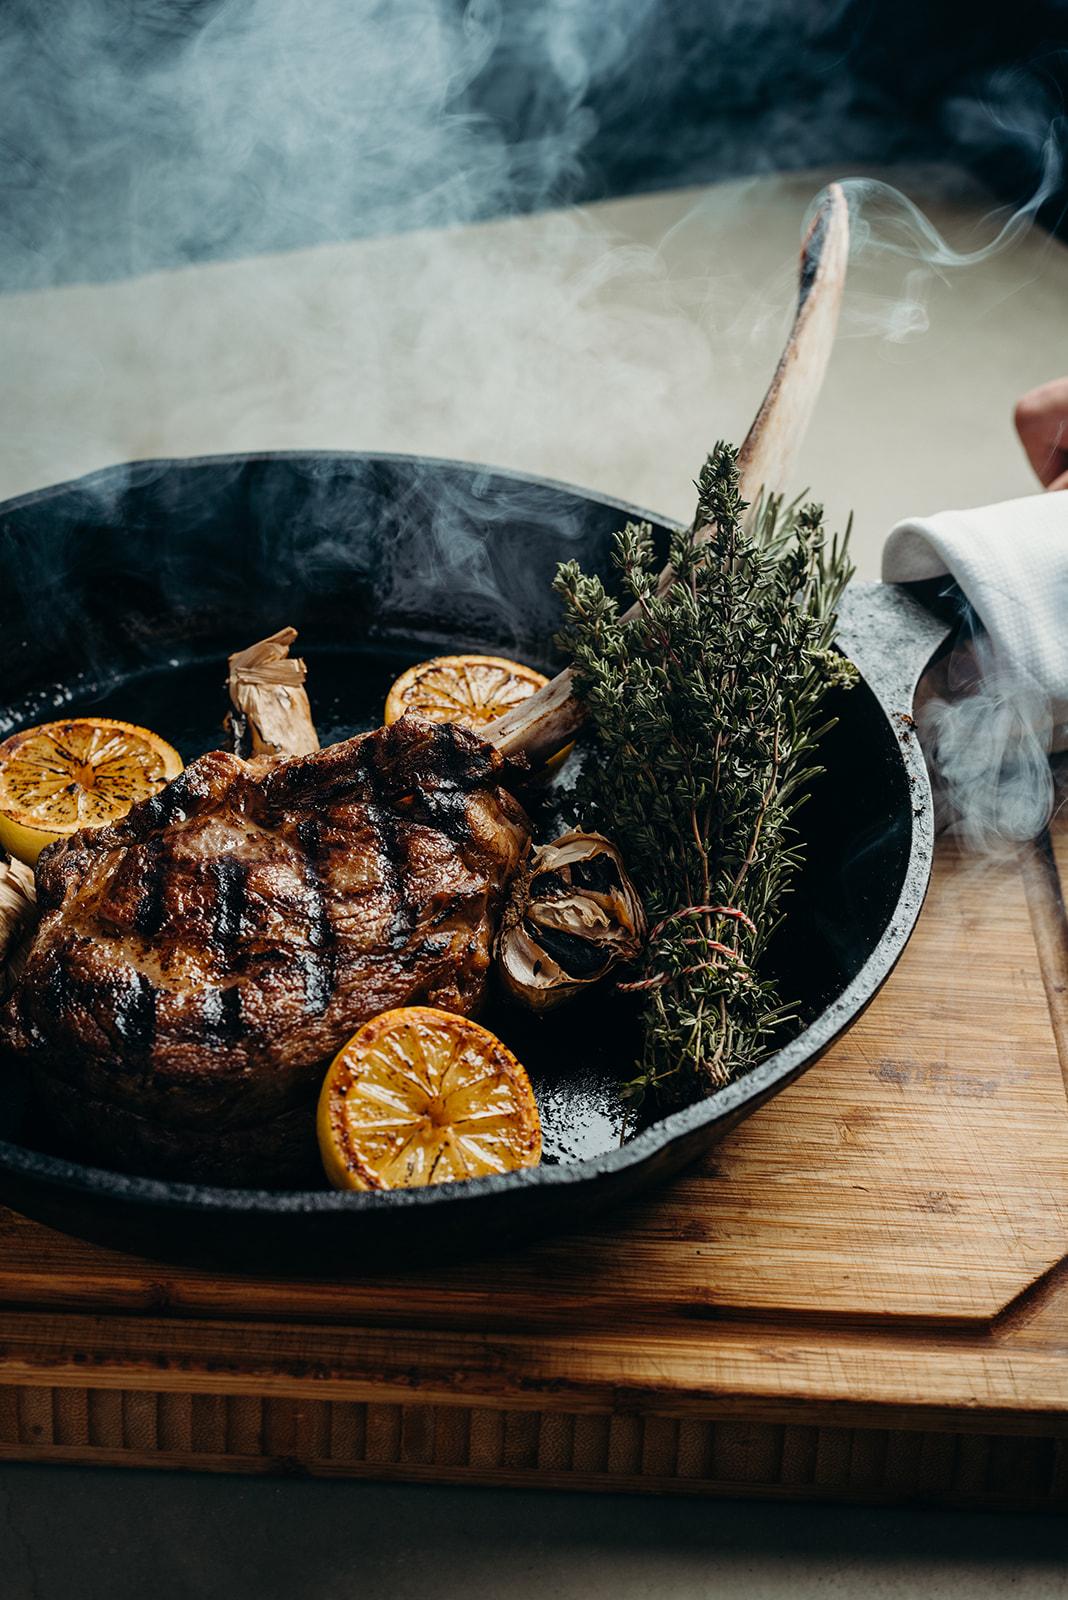 Tomahawk Steak at  Mr. Lyon's  image credit:  Sarah Dickenson